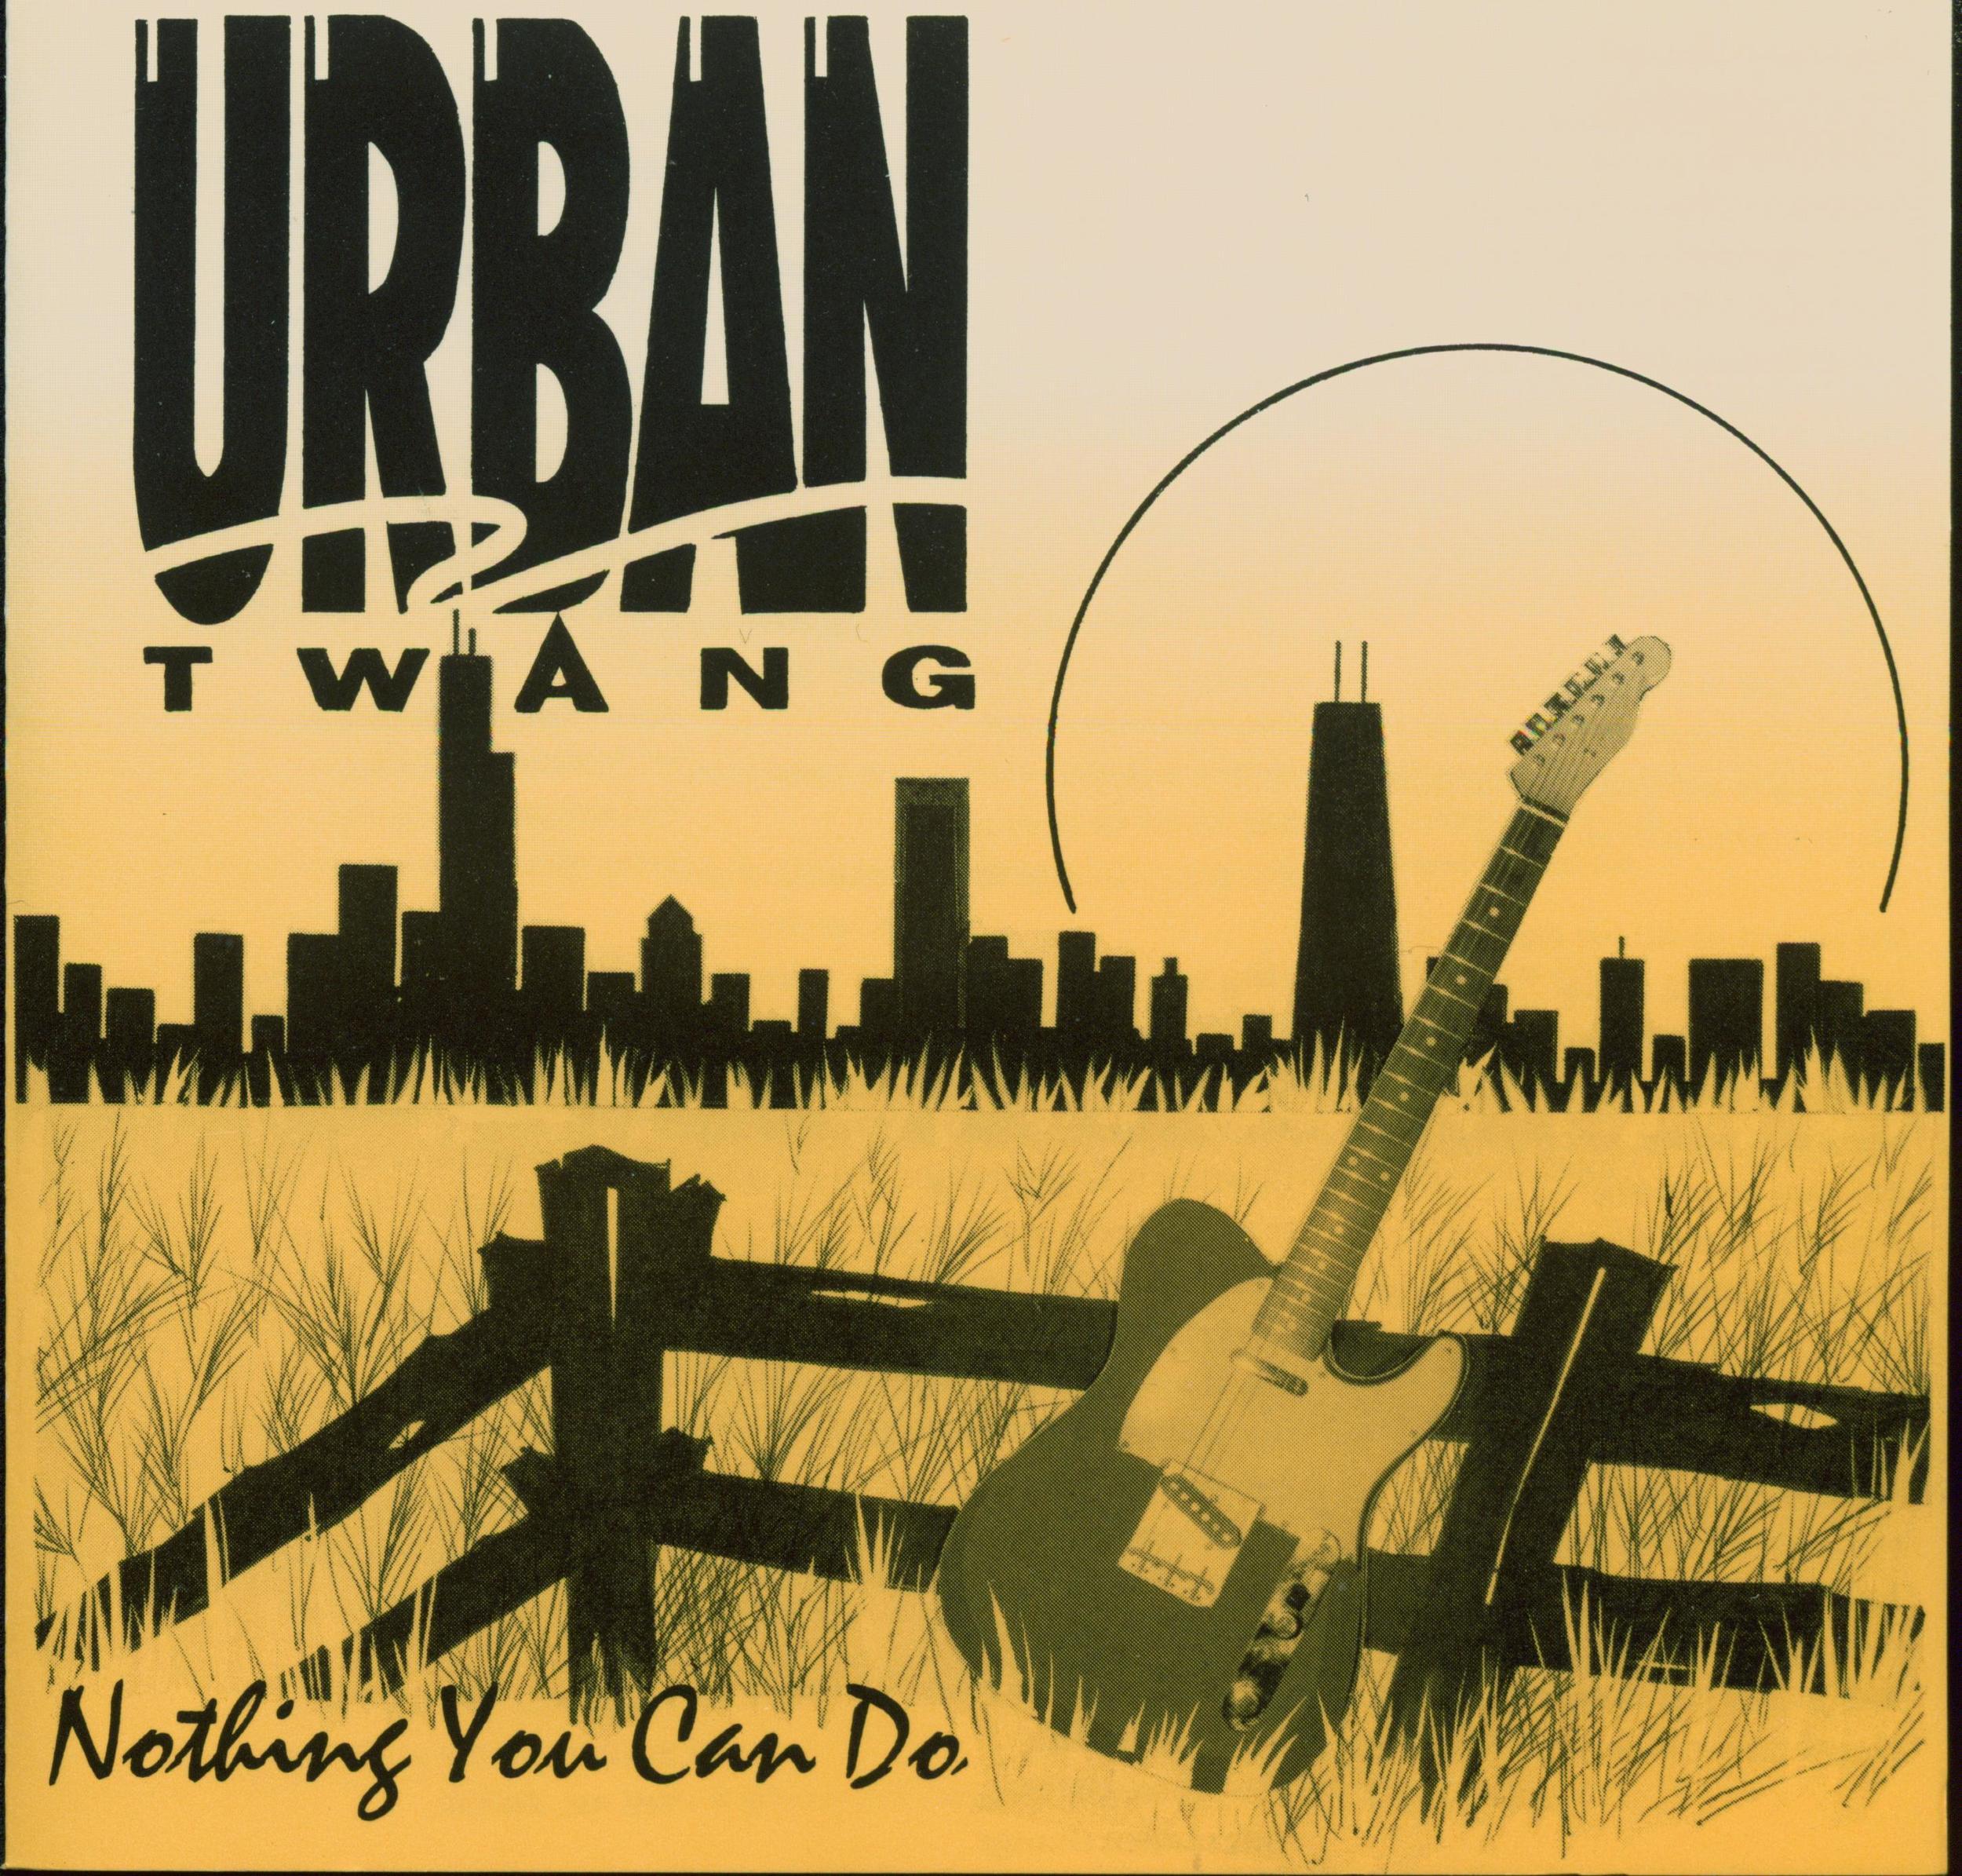 Urban Twang Nothing You Can Do Album Artwork